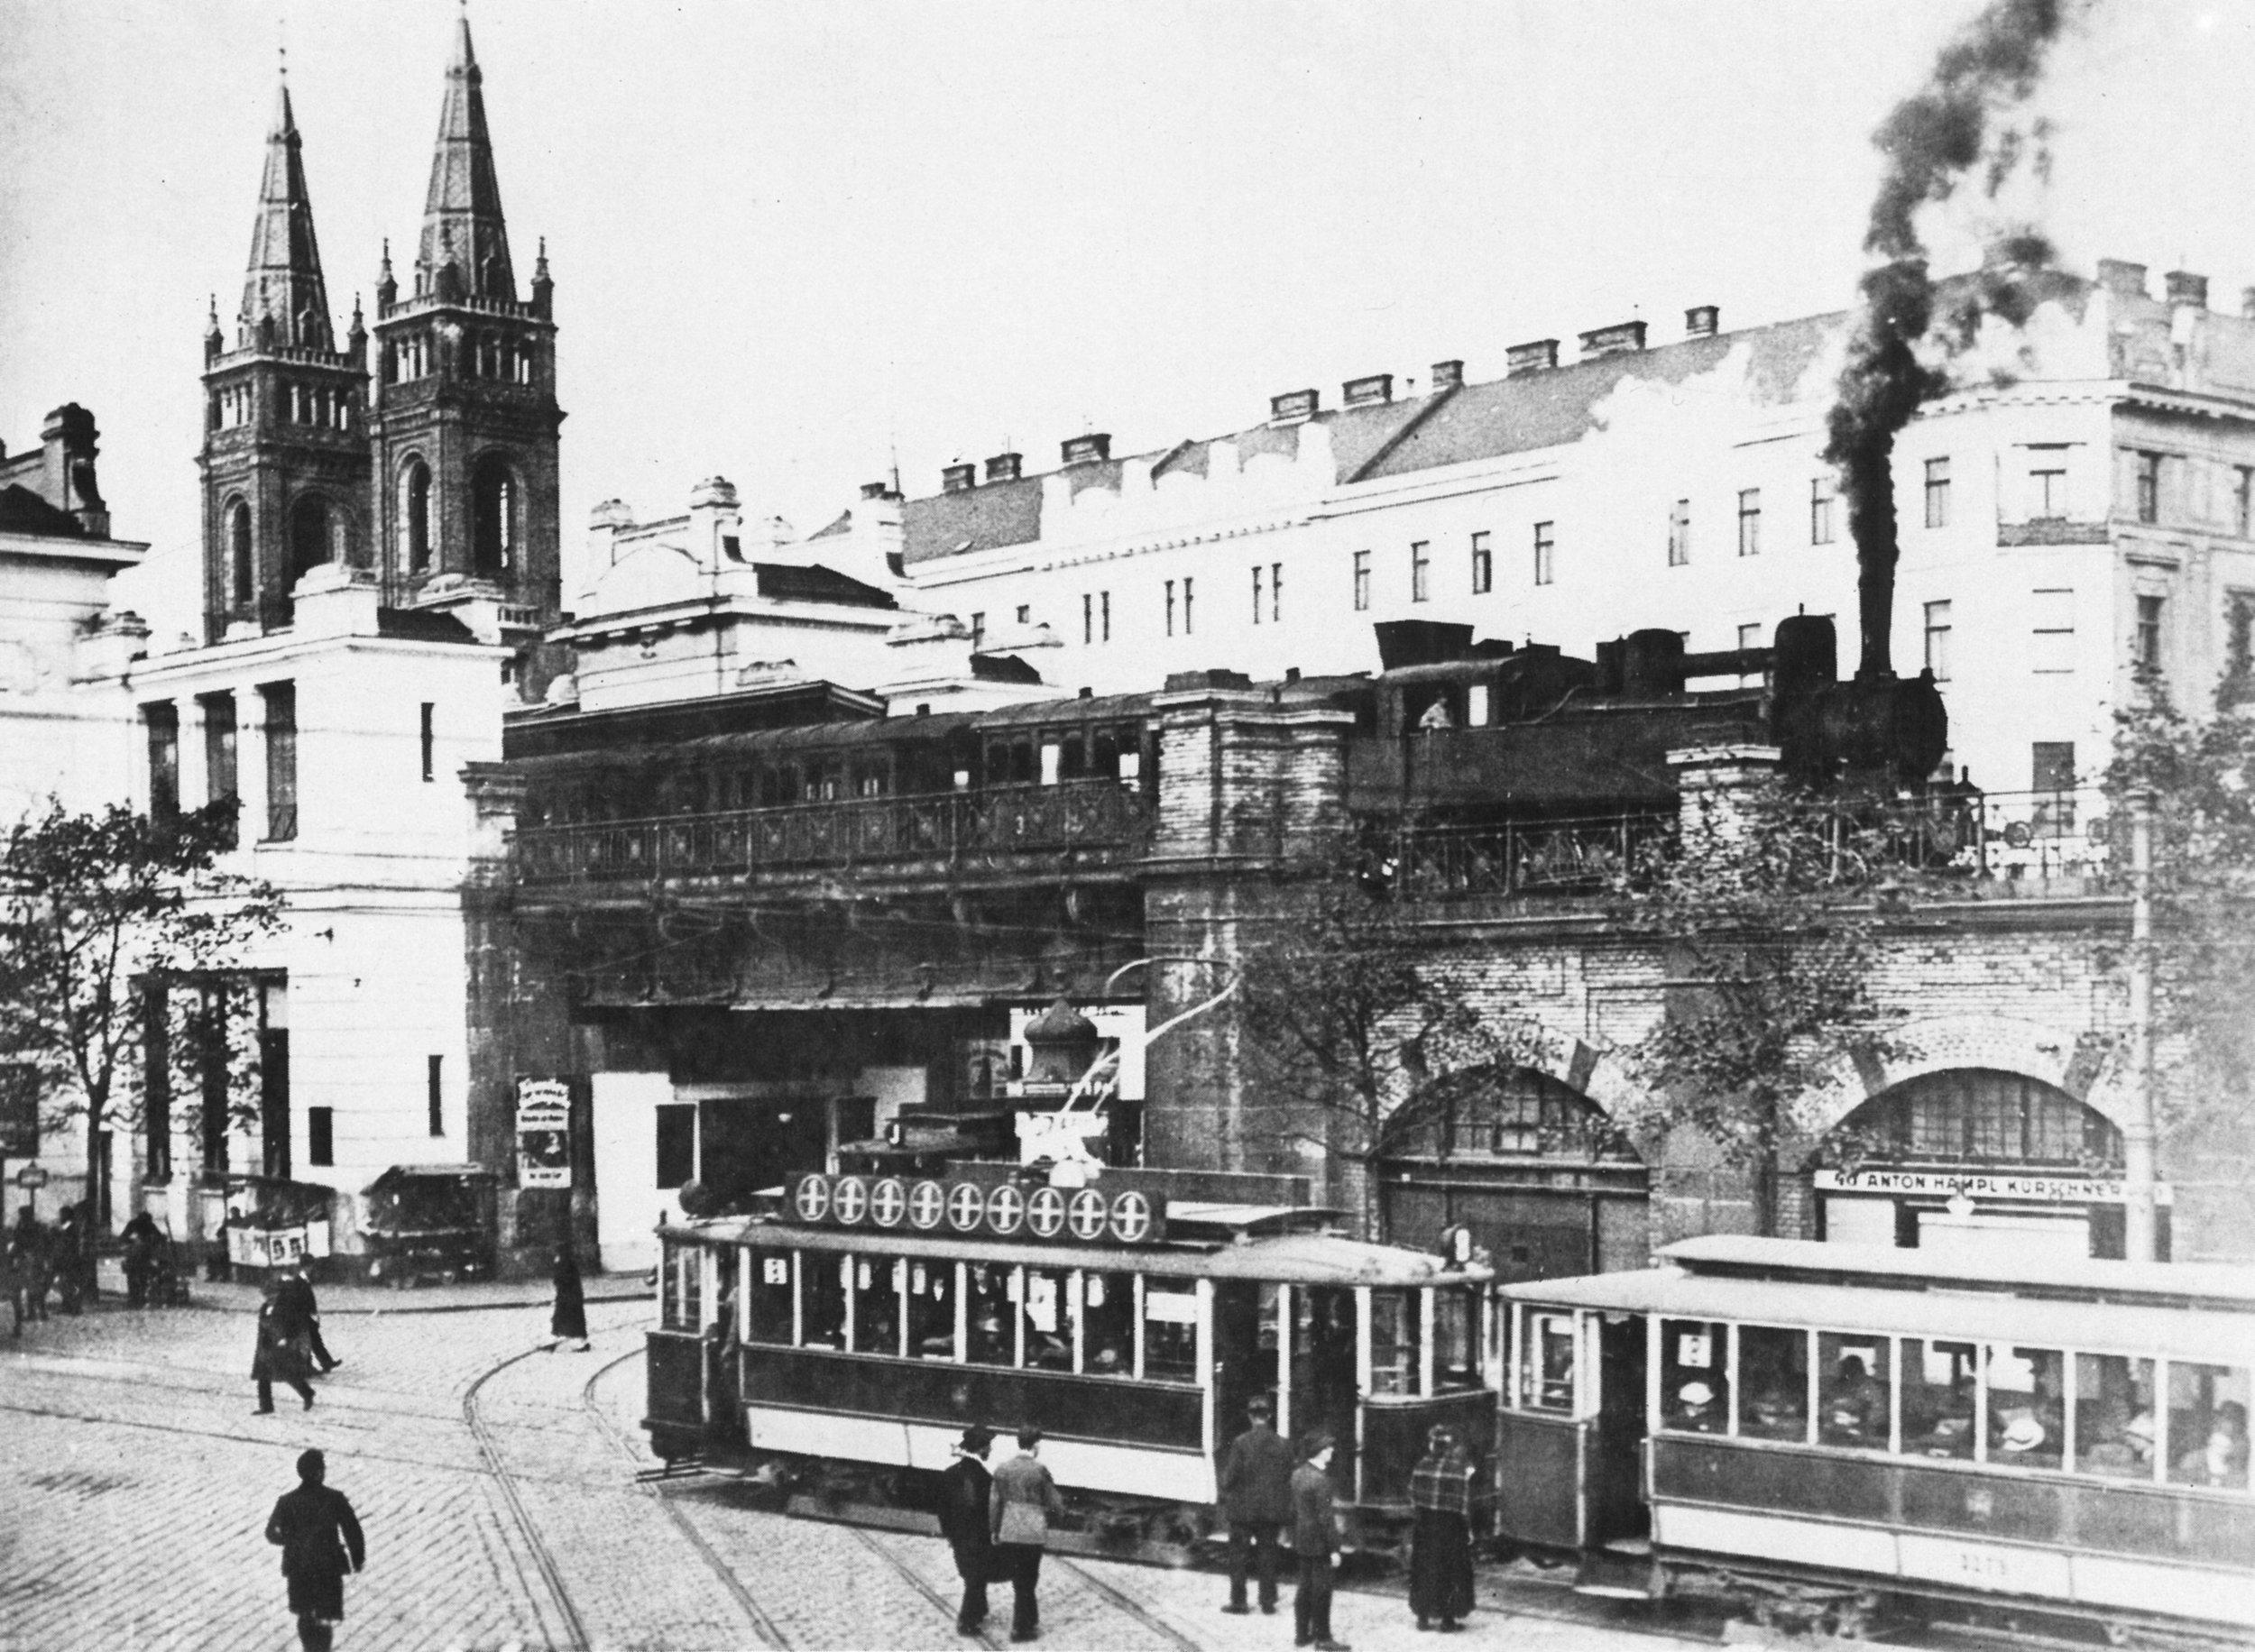 The Vienna  Stadbahn  before electrification, around 1910. Wikimedia/ public domain.